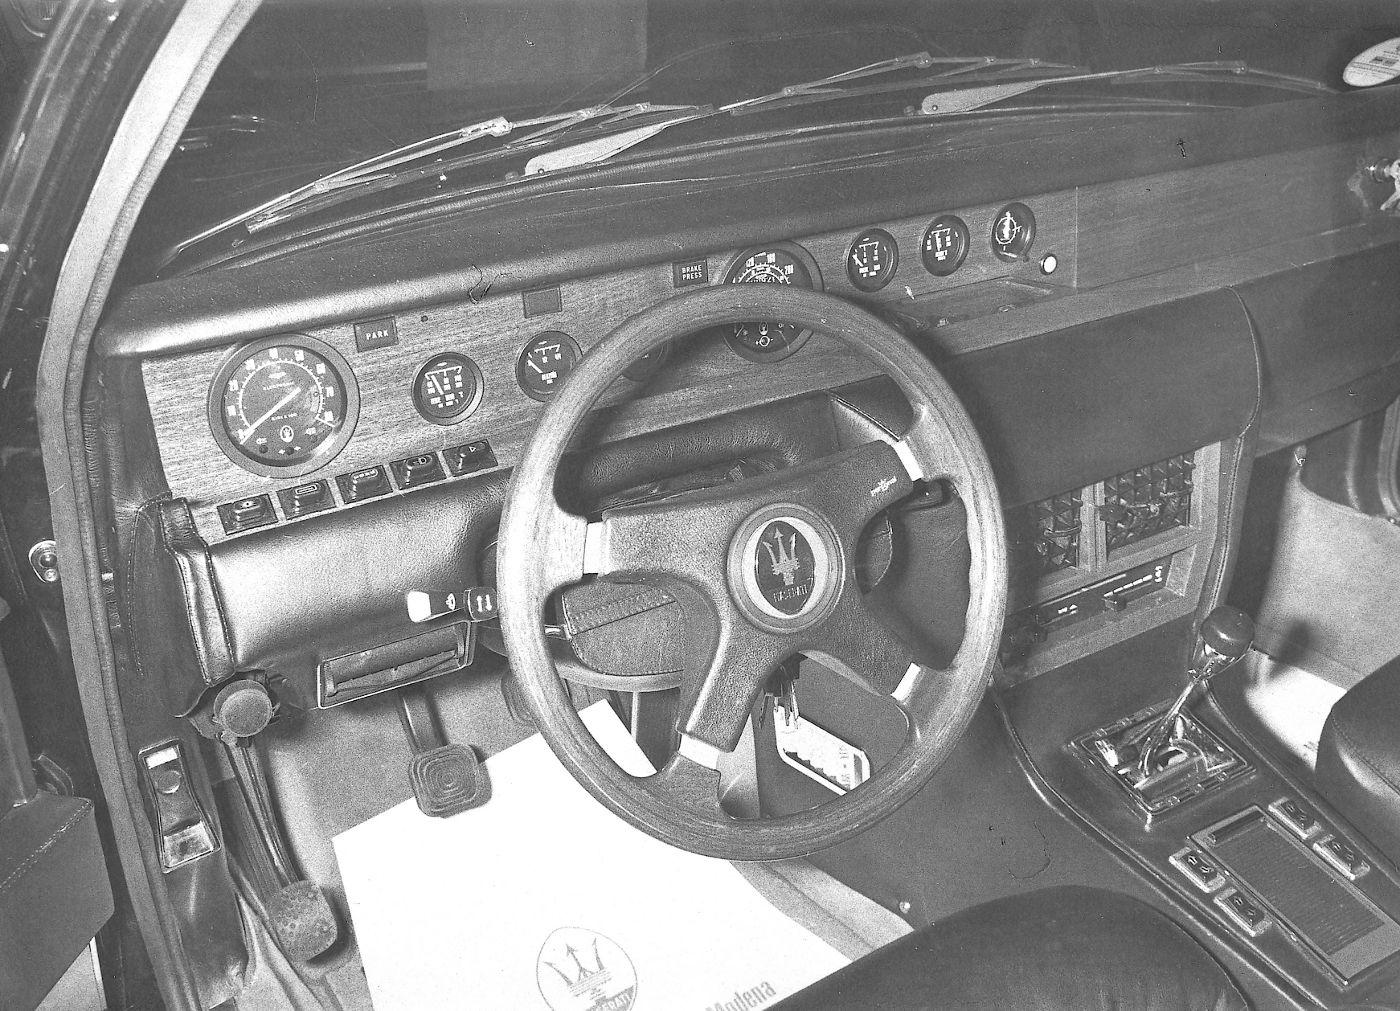 1974 Maserati Quattroporte II - interior view of the classic sedan